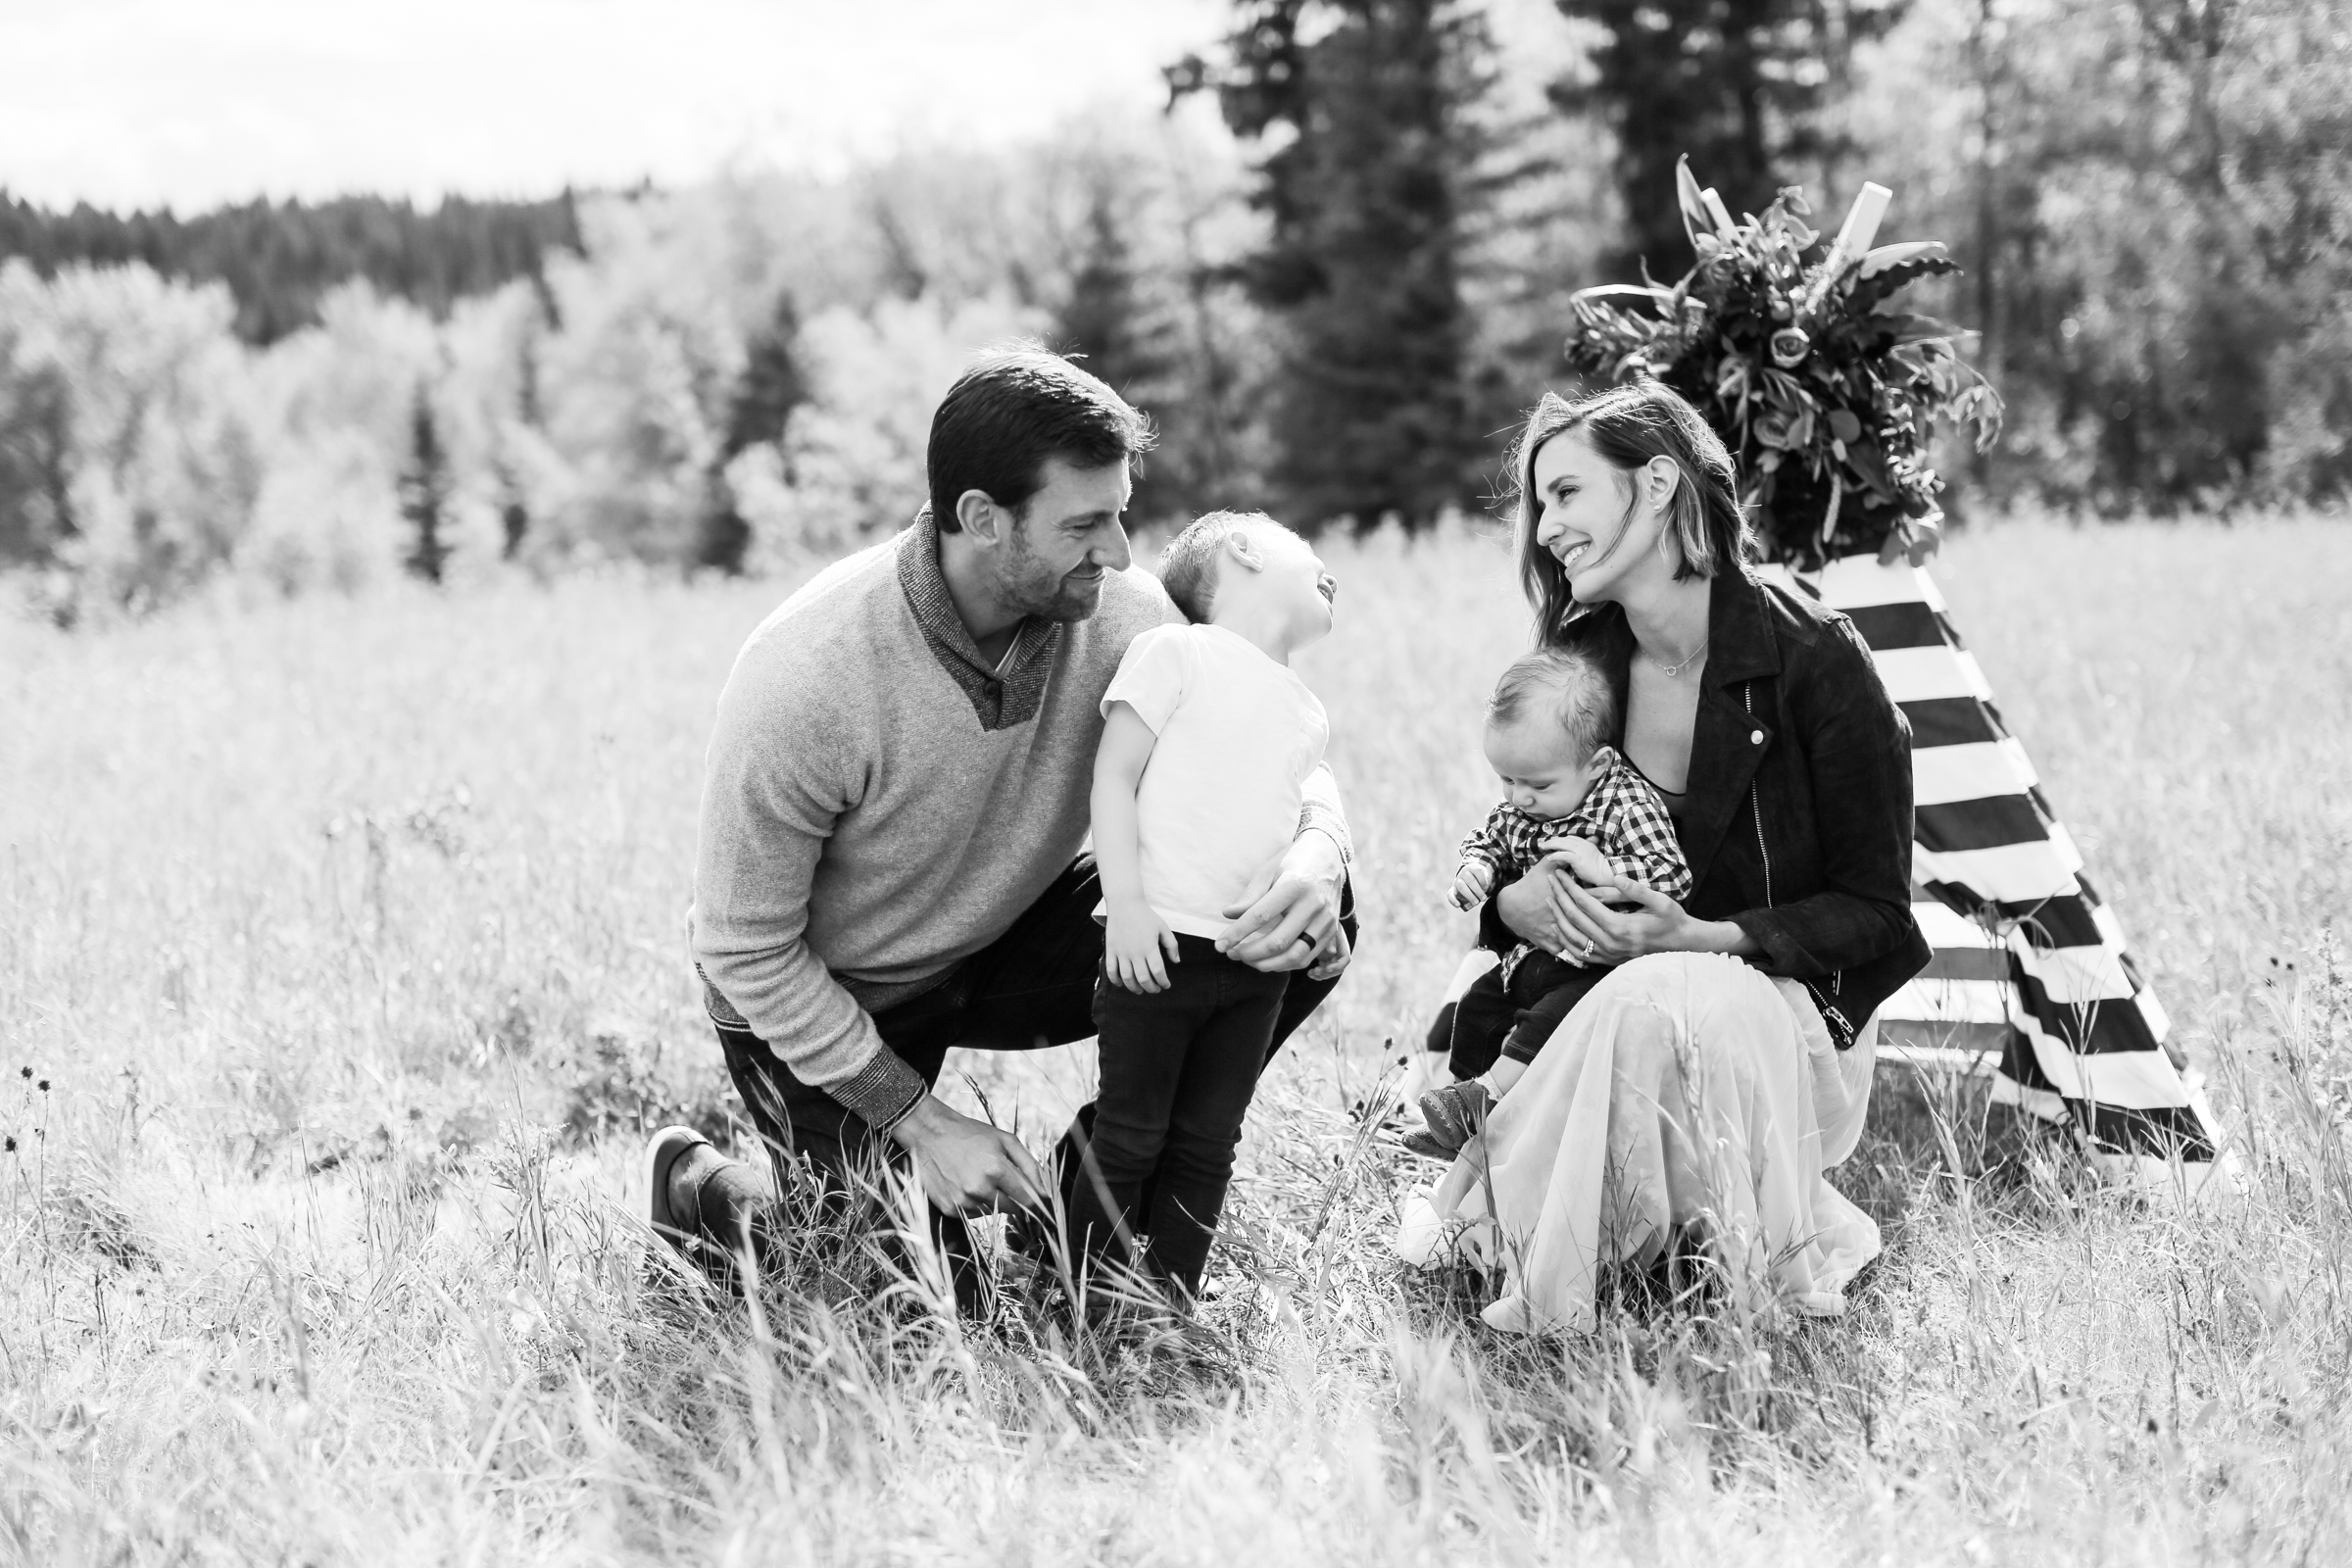 Fall-Family-Creative-Lindsay_Skeans_Photography-24.jpg